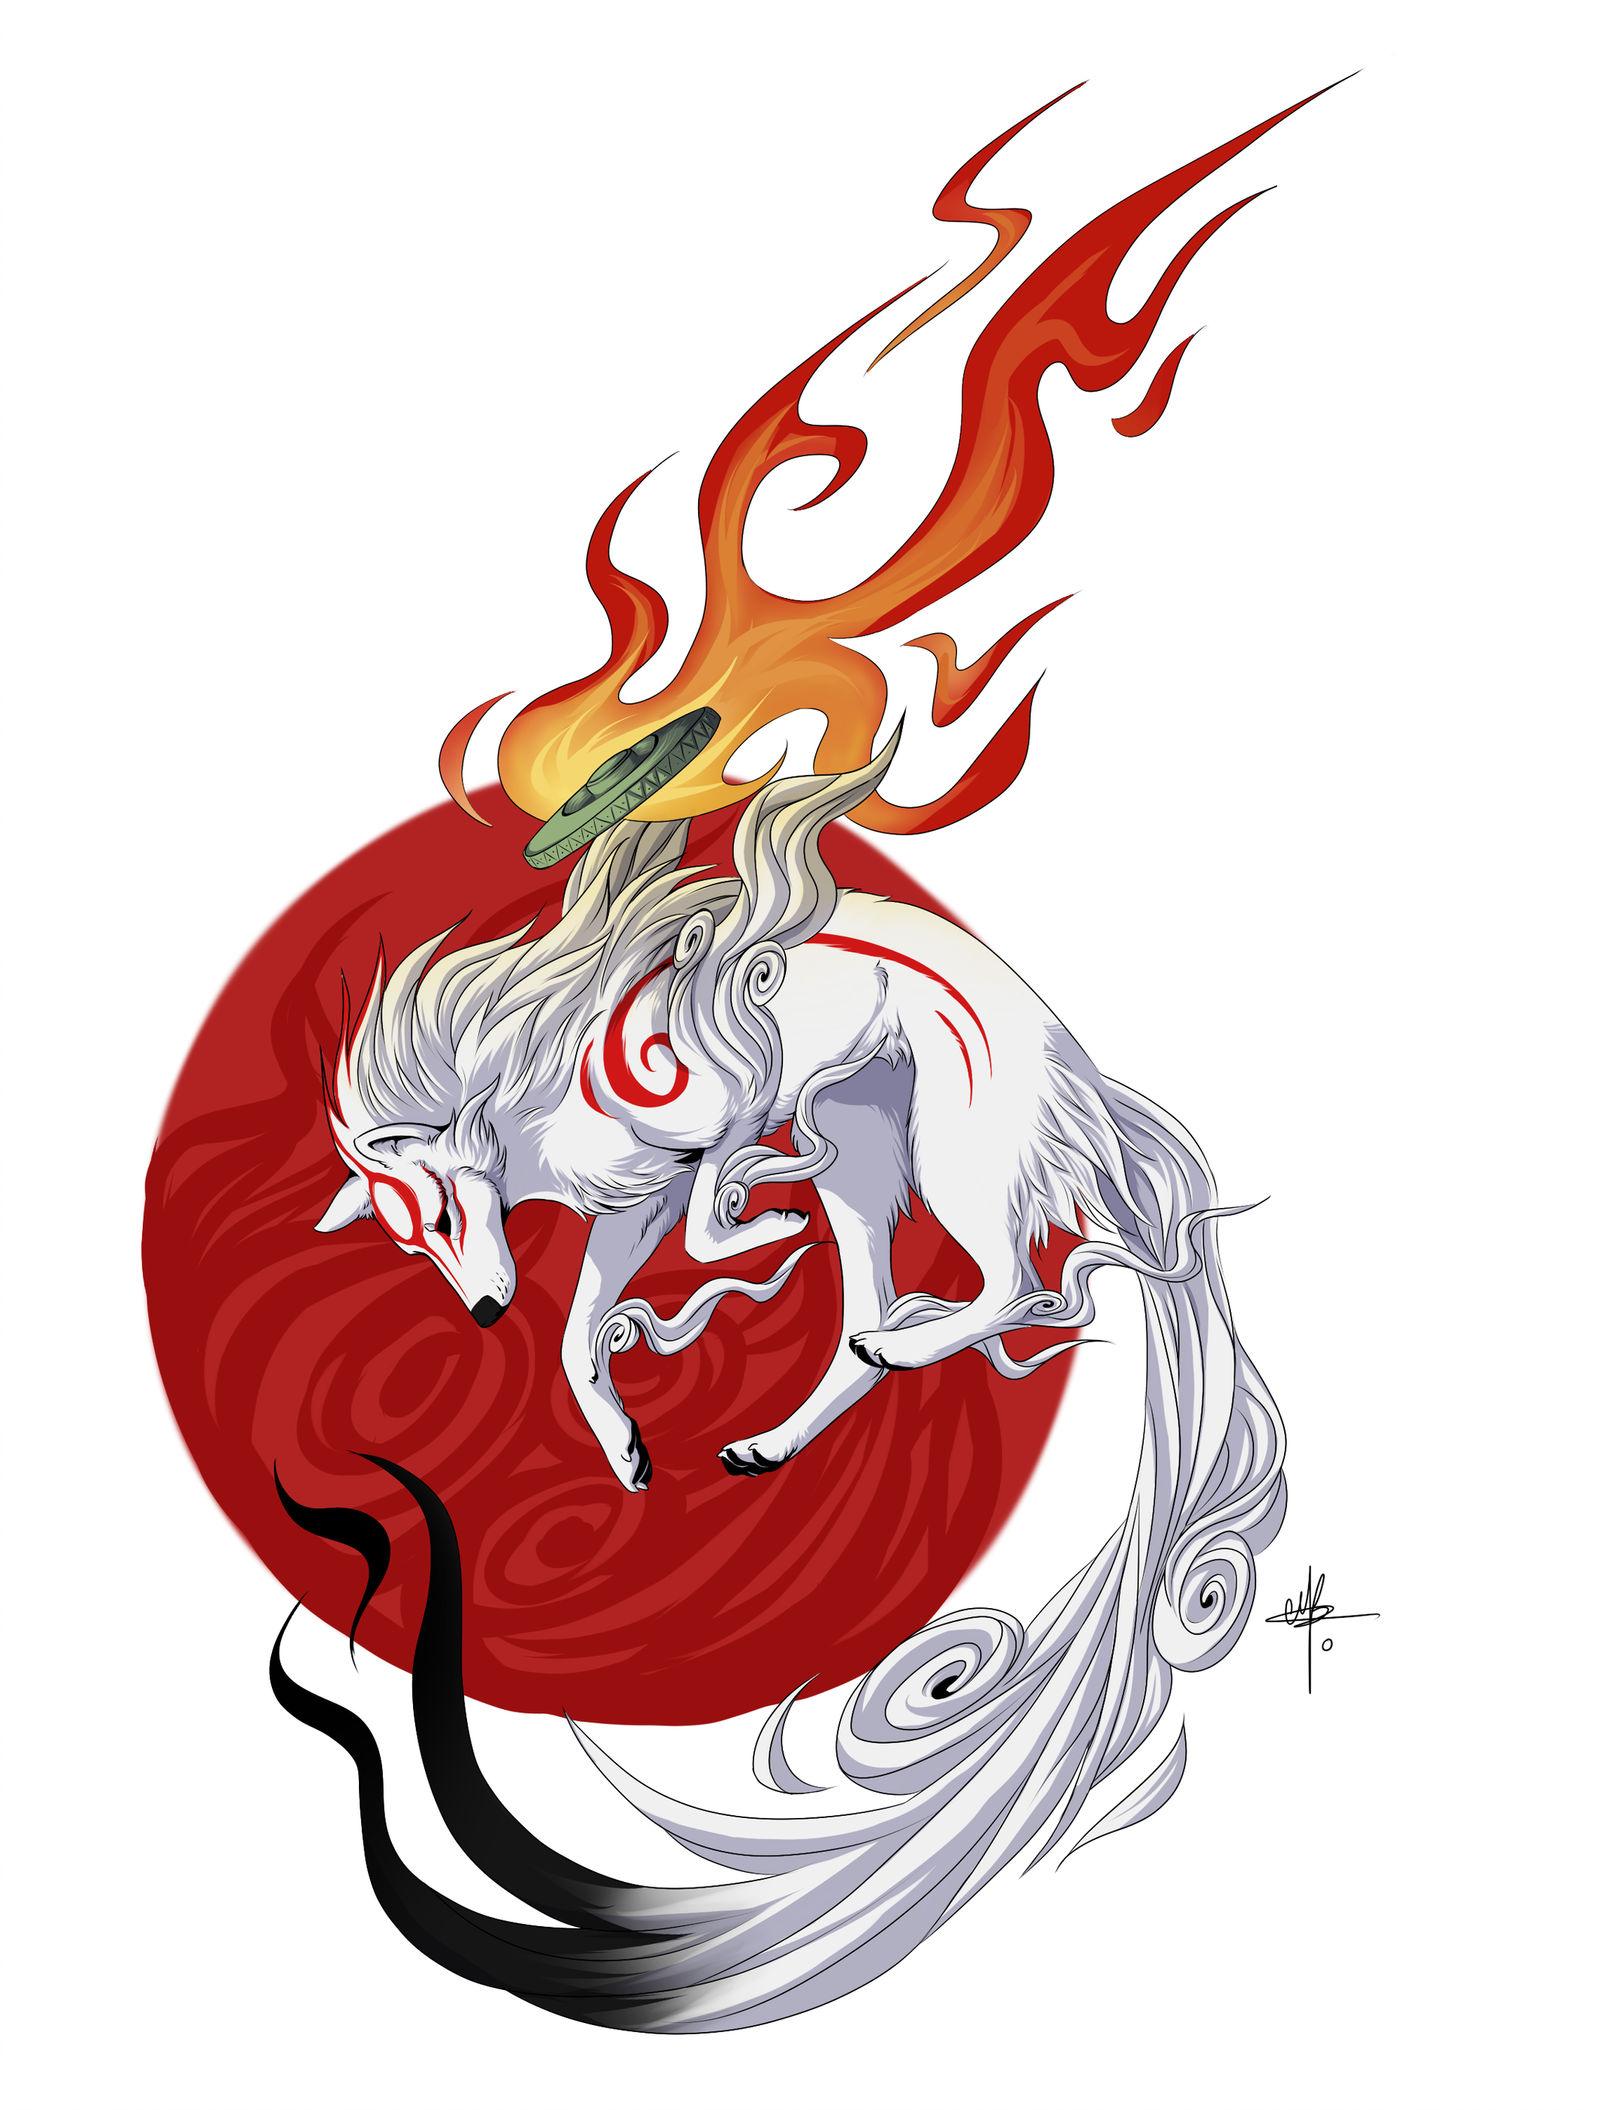 CE - Okami Amaterasu by MayhWolf